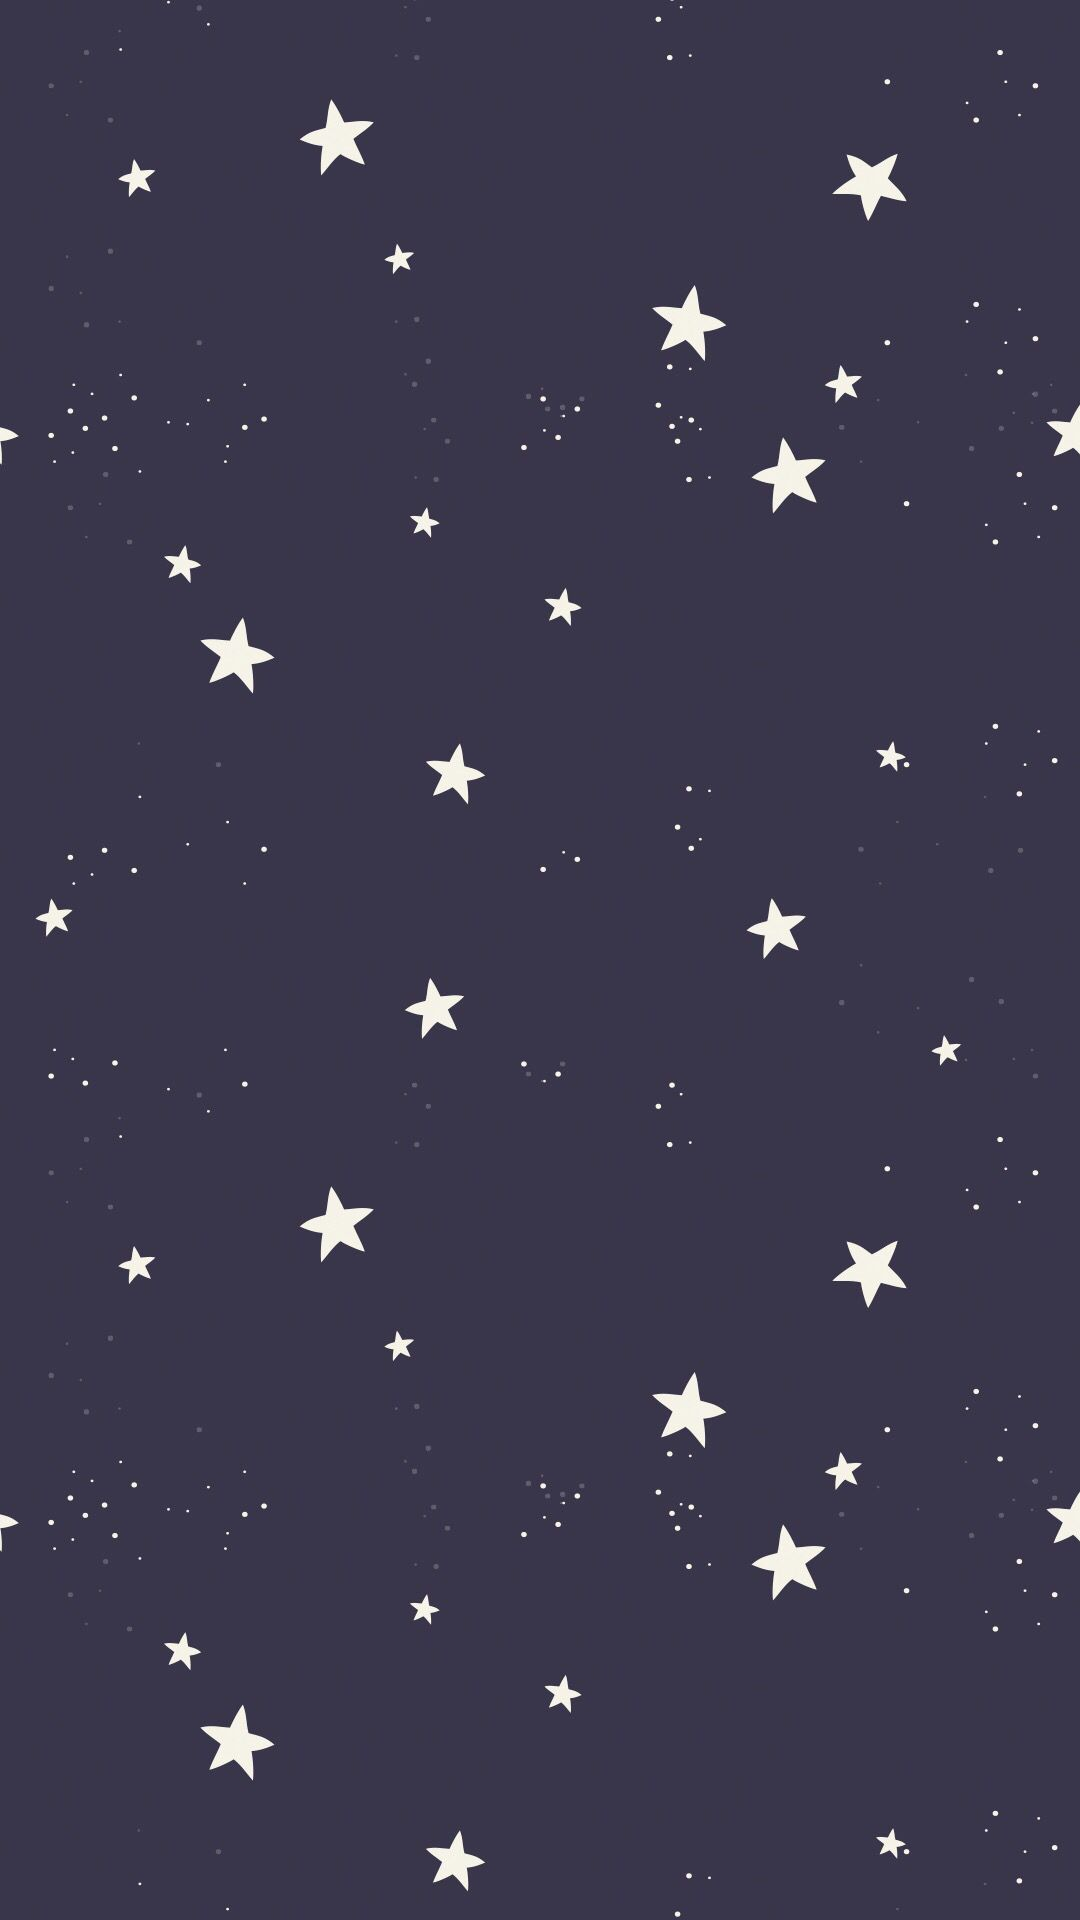 Simple Stars Pattern iPhone 6 wallpaper Star wallpaper Phone 1080x1920